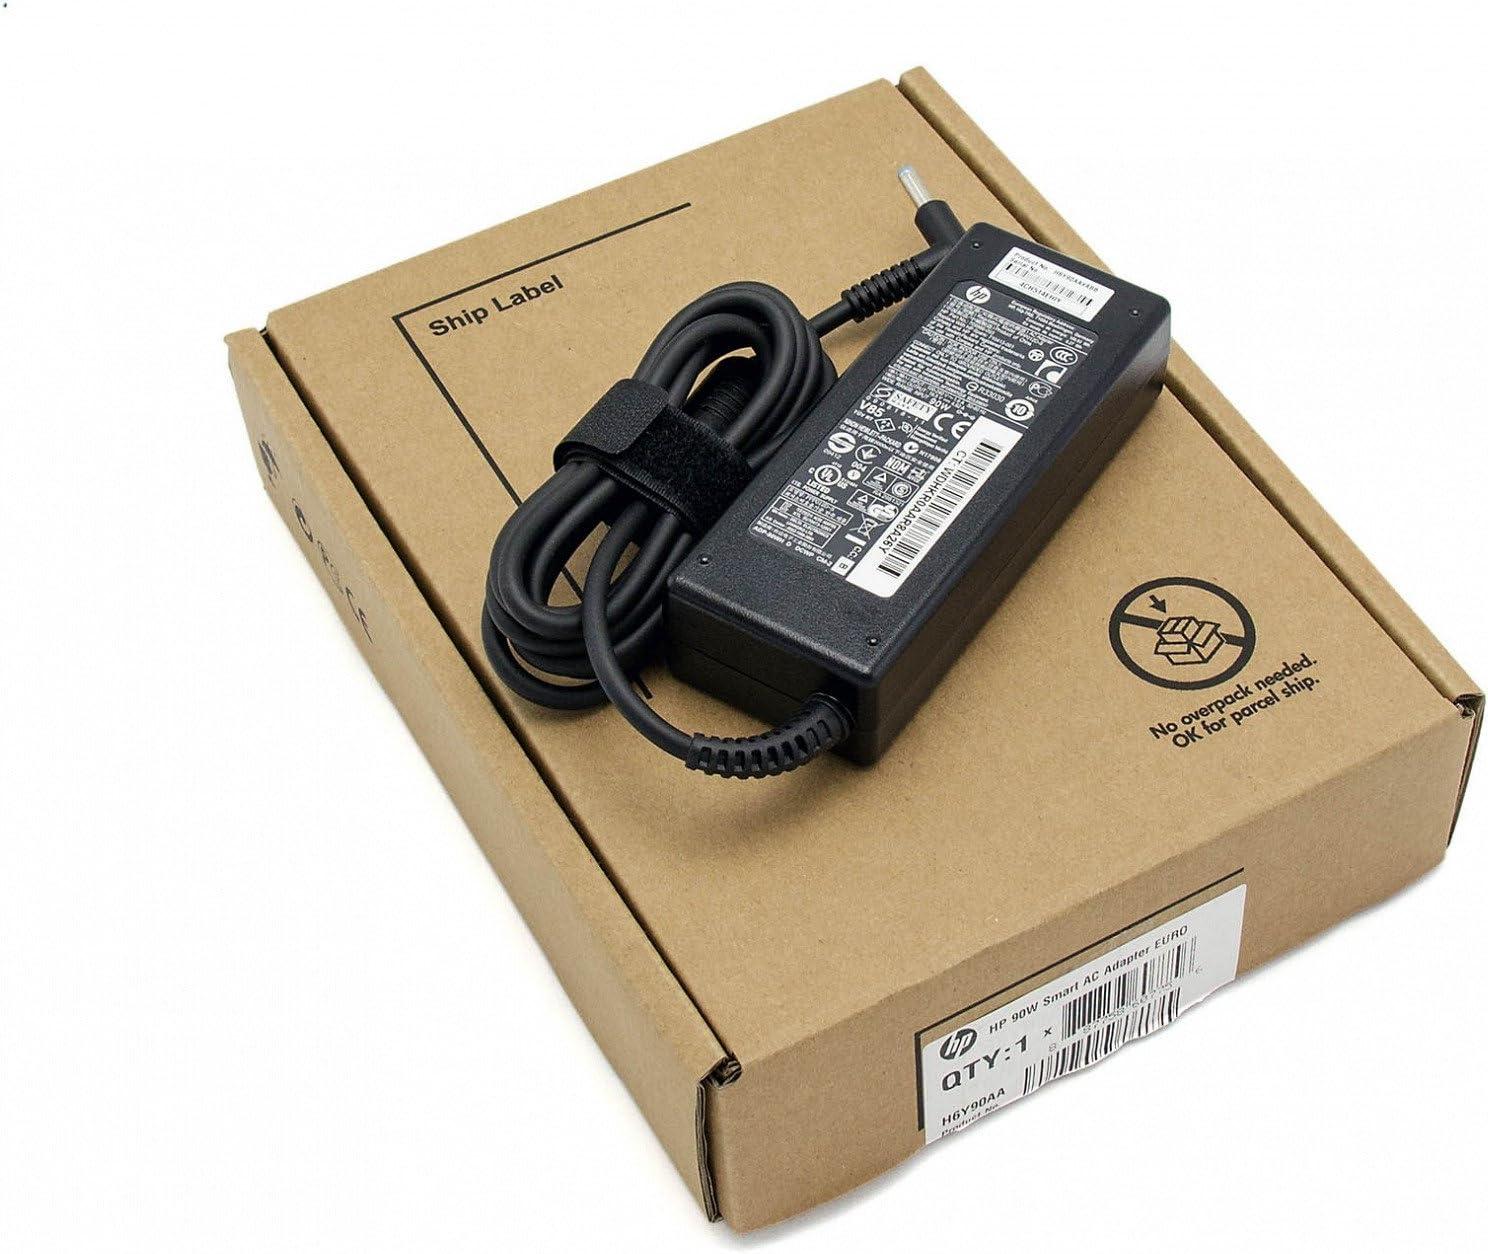 power supply - 90 Watt 709986-001 for Hewlett Packard 240 / 242 / 248 / 250 / Envy 15-j000, 15t-j100, 15z-j000, 15z-j100, 17-j000, 17-j100, 17t-j000 / Pavilion 15-e000, 15-n000, 15t-e000, 17-e000, m4-1000 / Spectre 13-3000 by HP